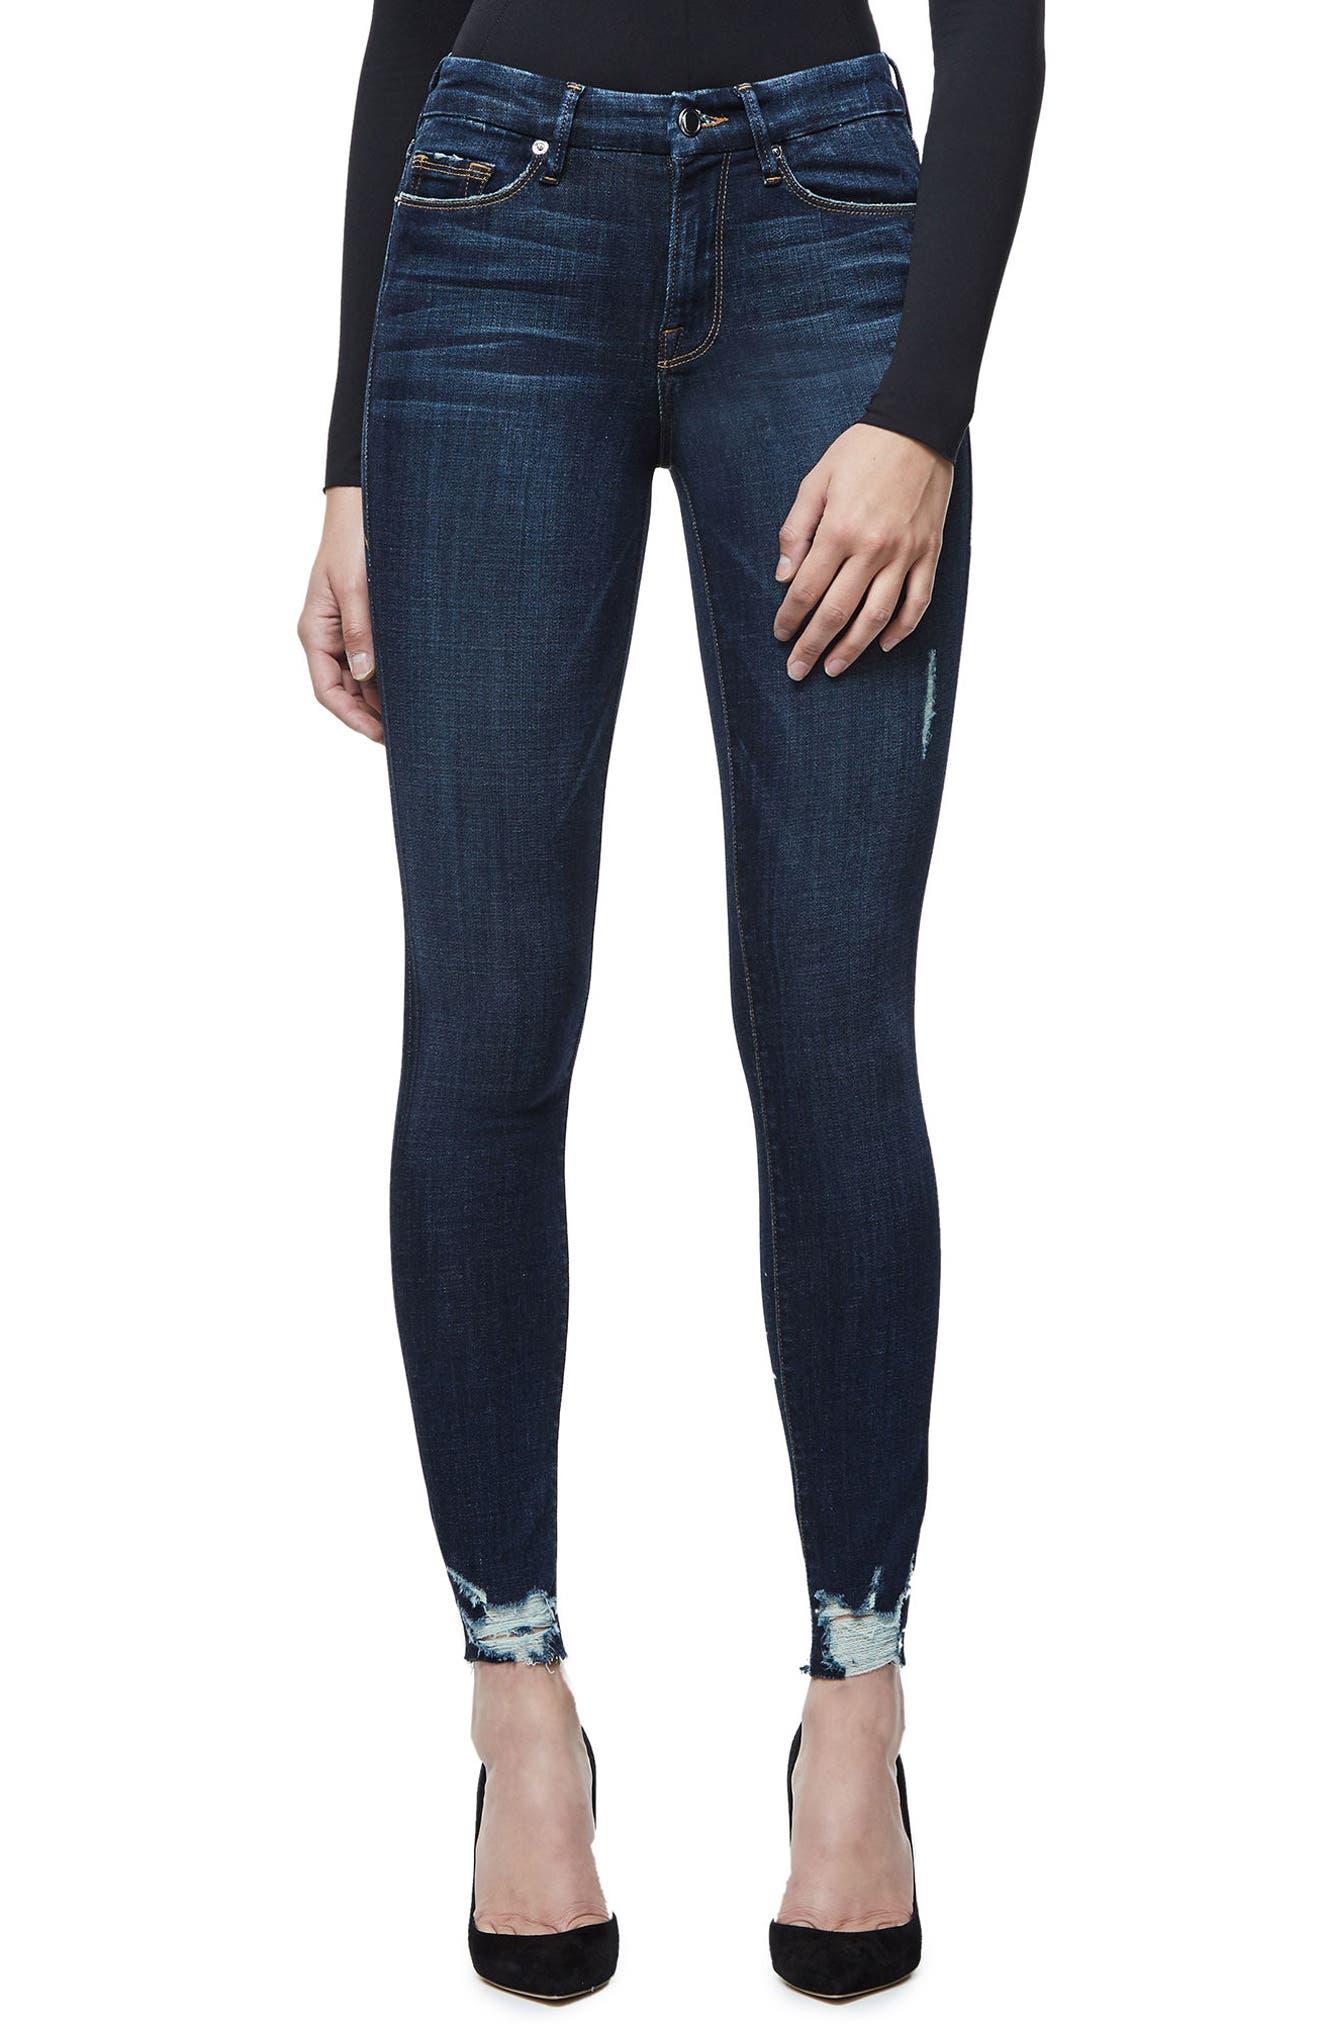 Alternate Image 1 Selected - Good American Good Legs Raw Hem Skinny Jeans (Blue 080) (Extended Sizes)